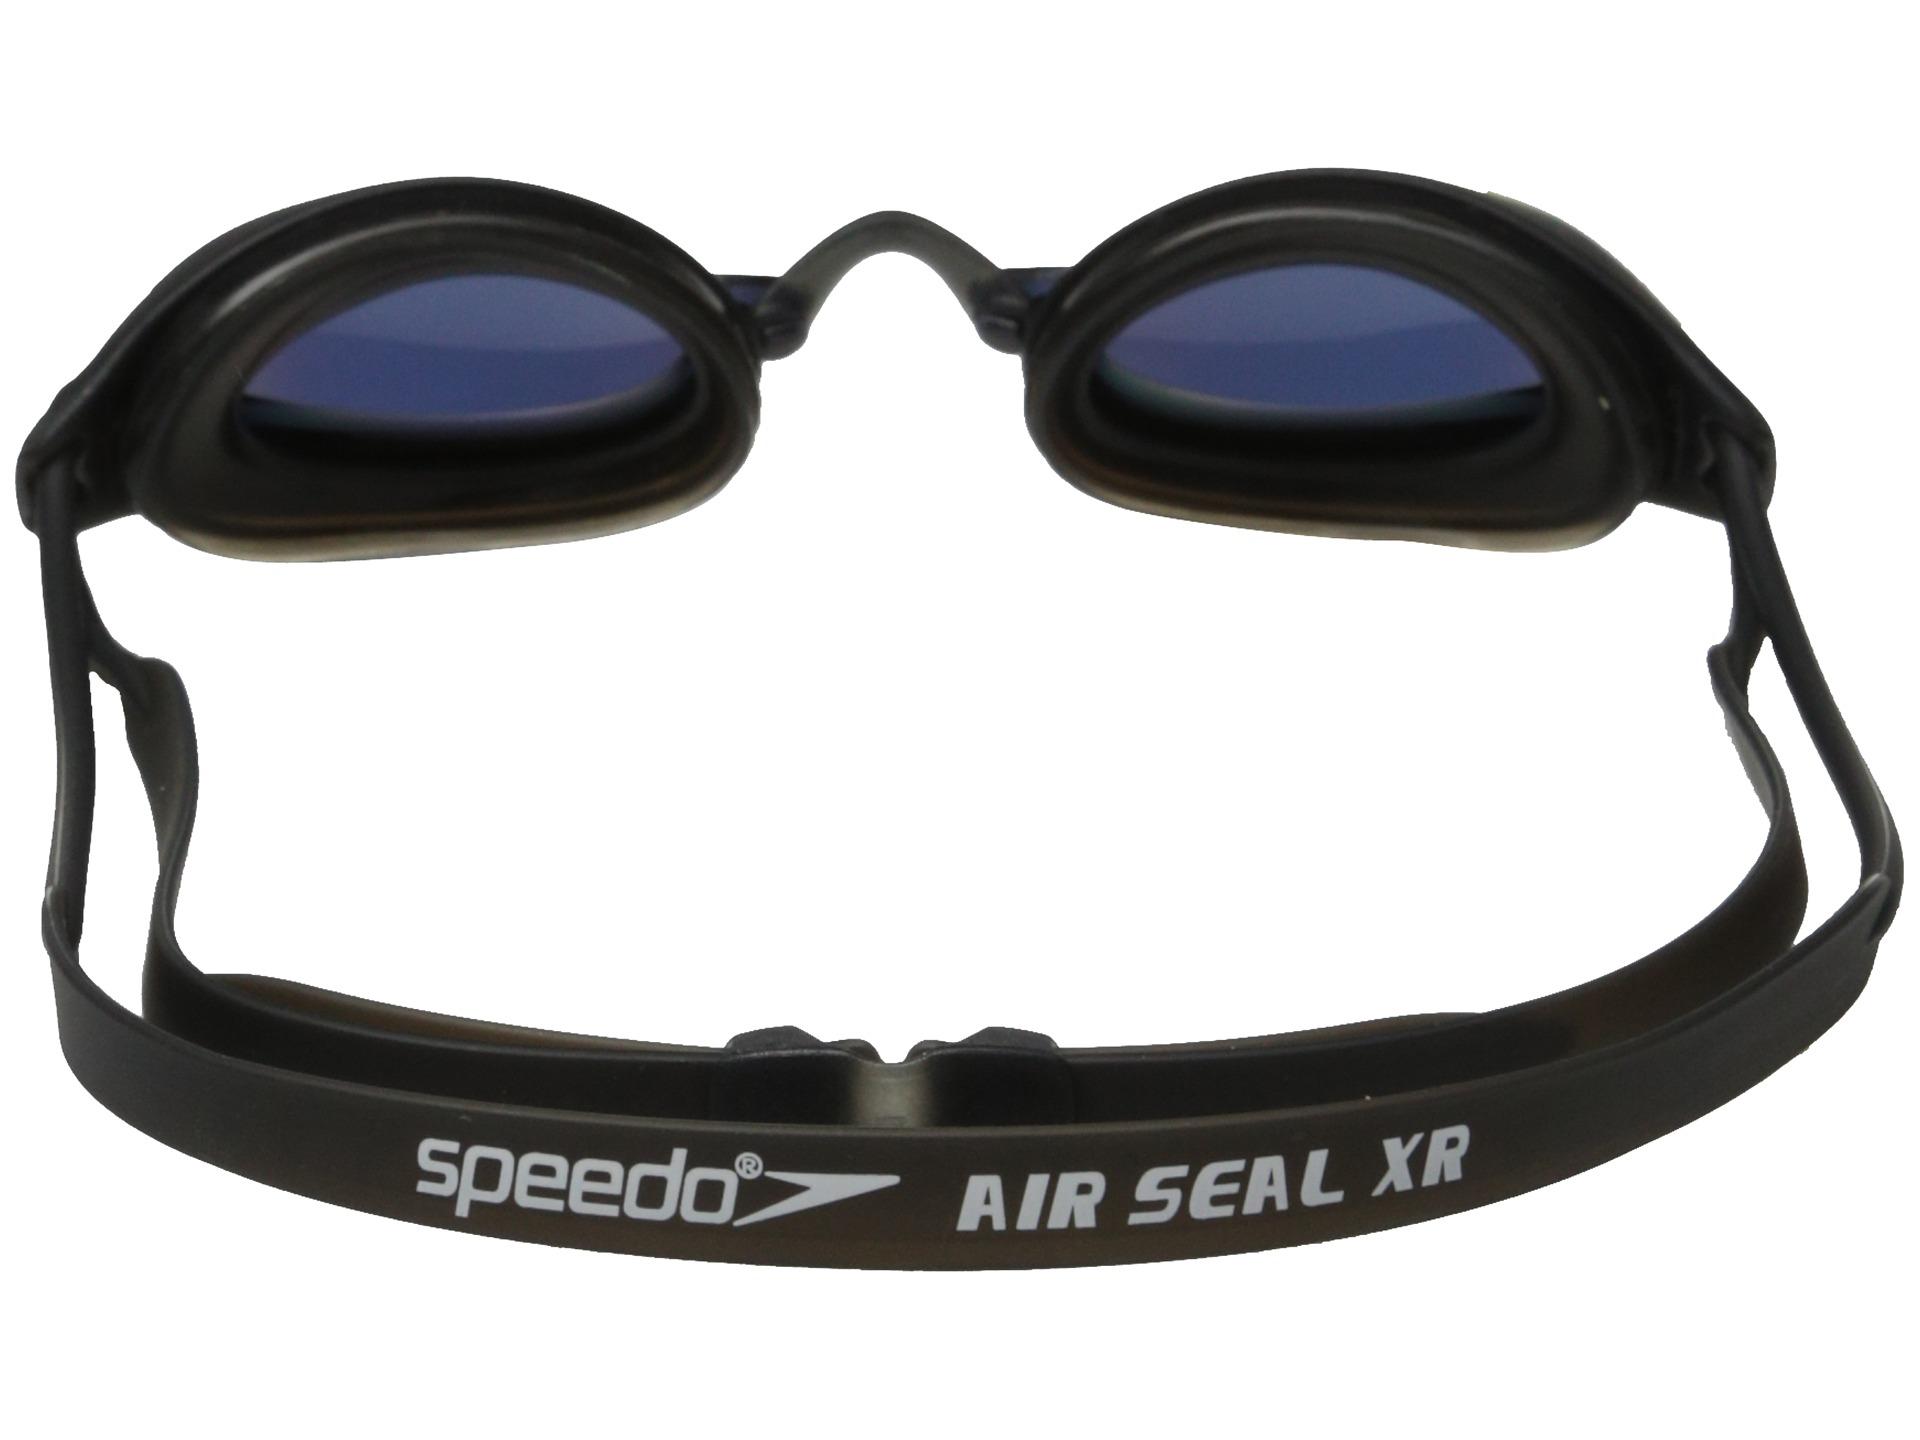 Speedo Air Seal Xr Mirrored Smoke Zappos Com Free